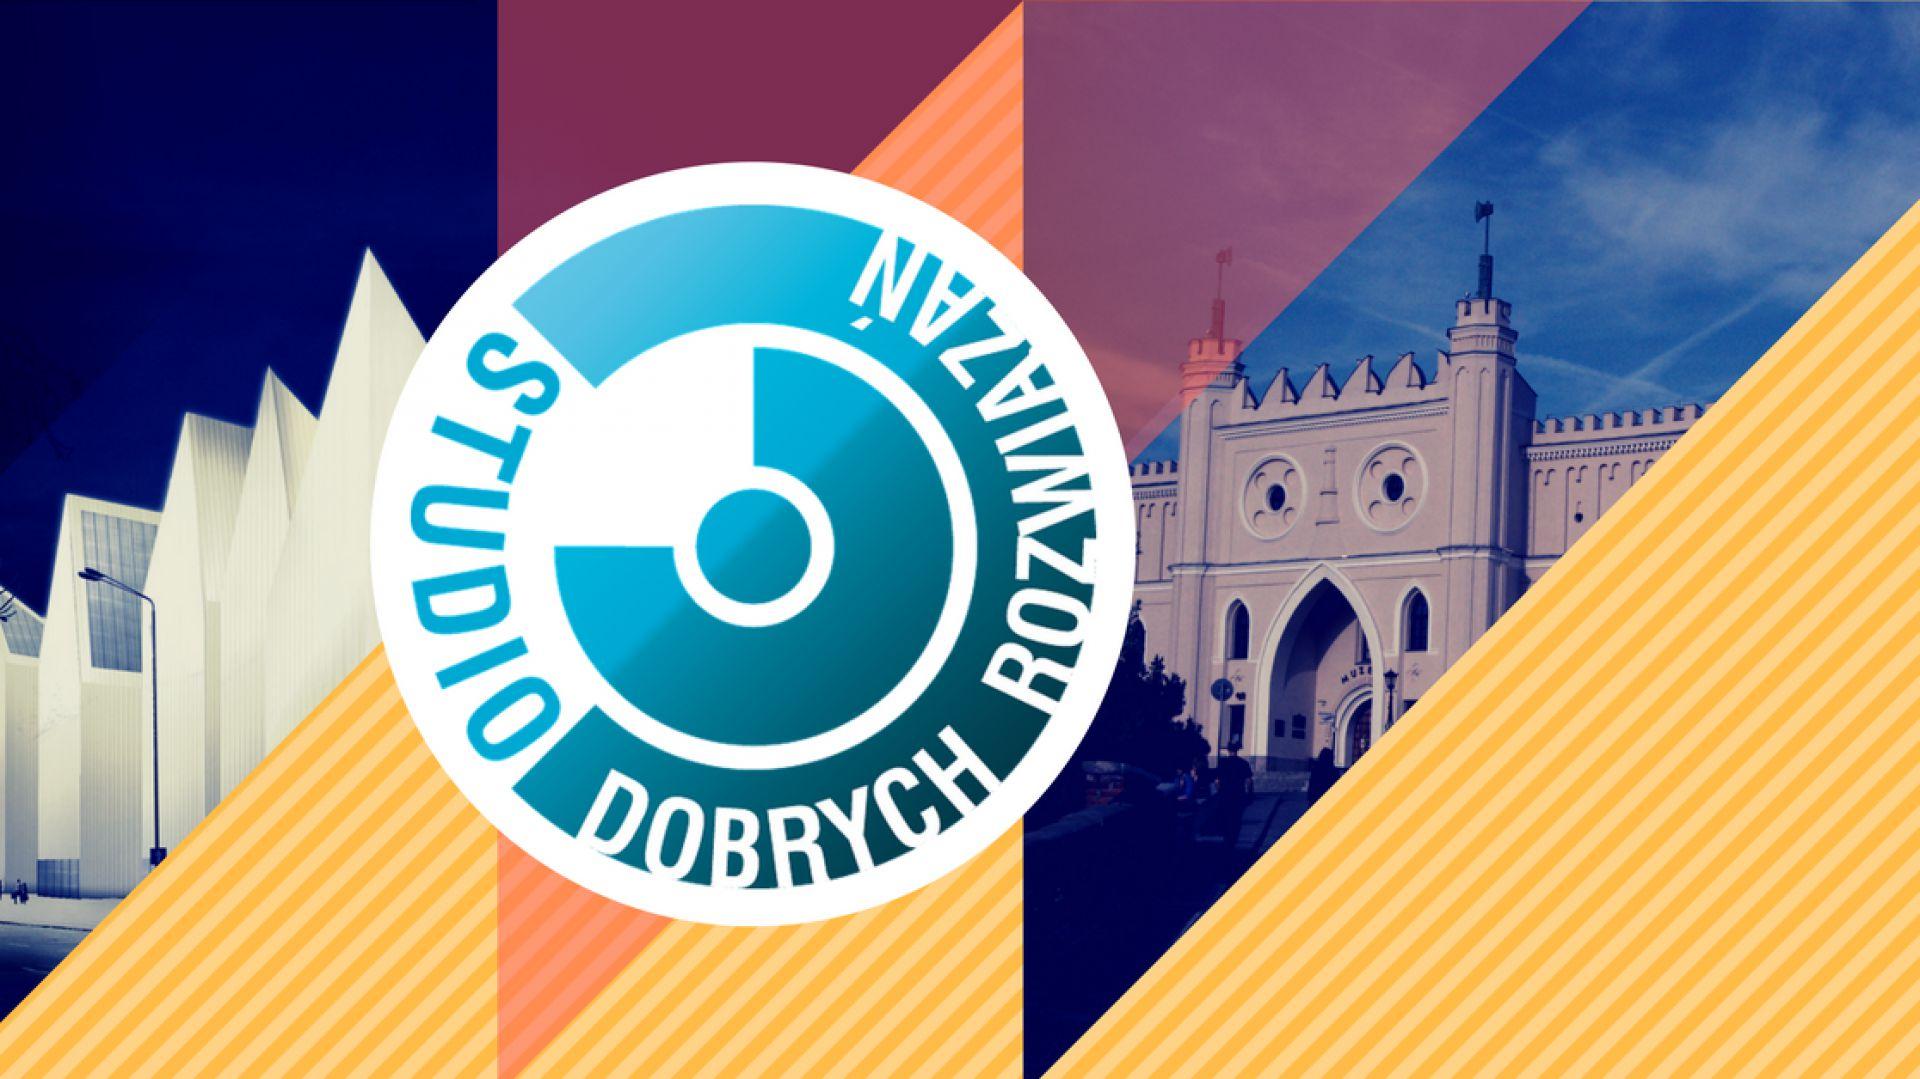 SDR Lublin Szczecin